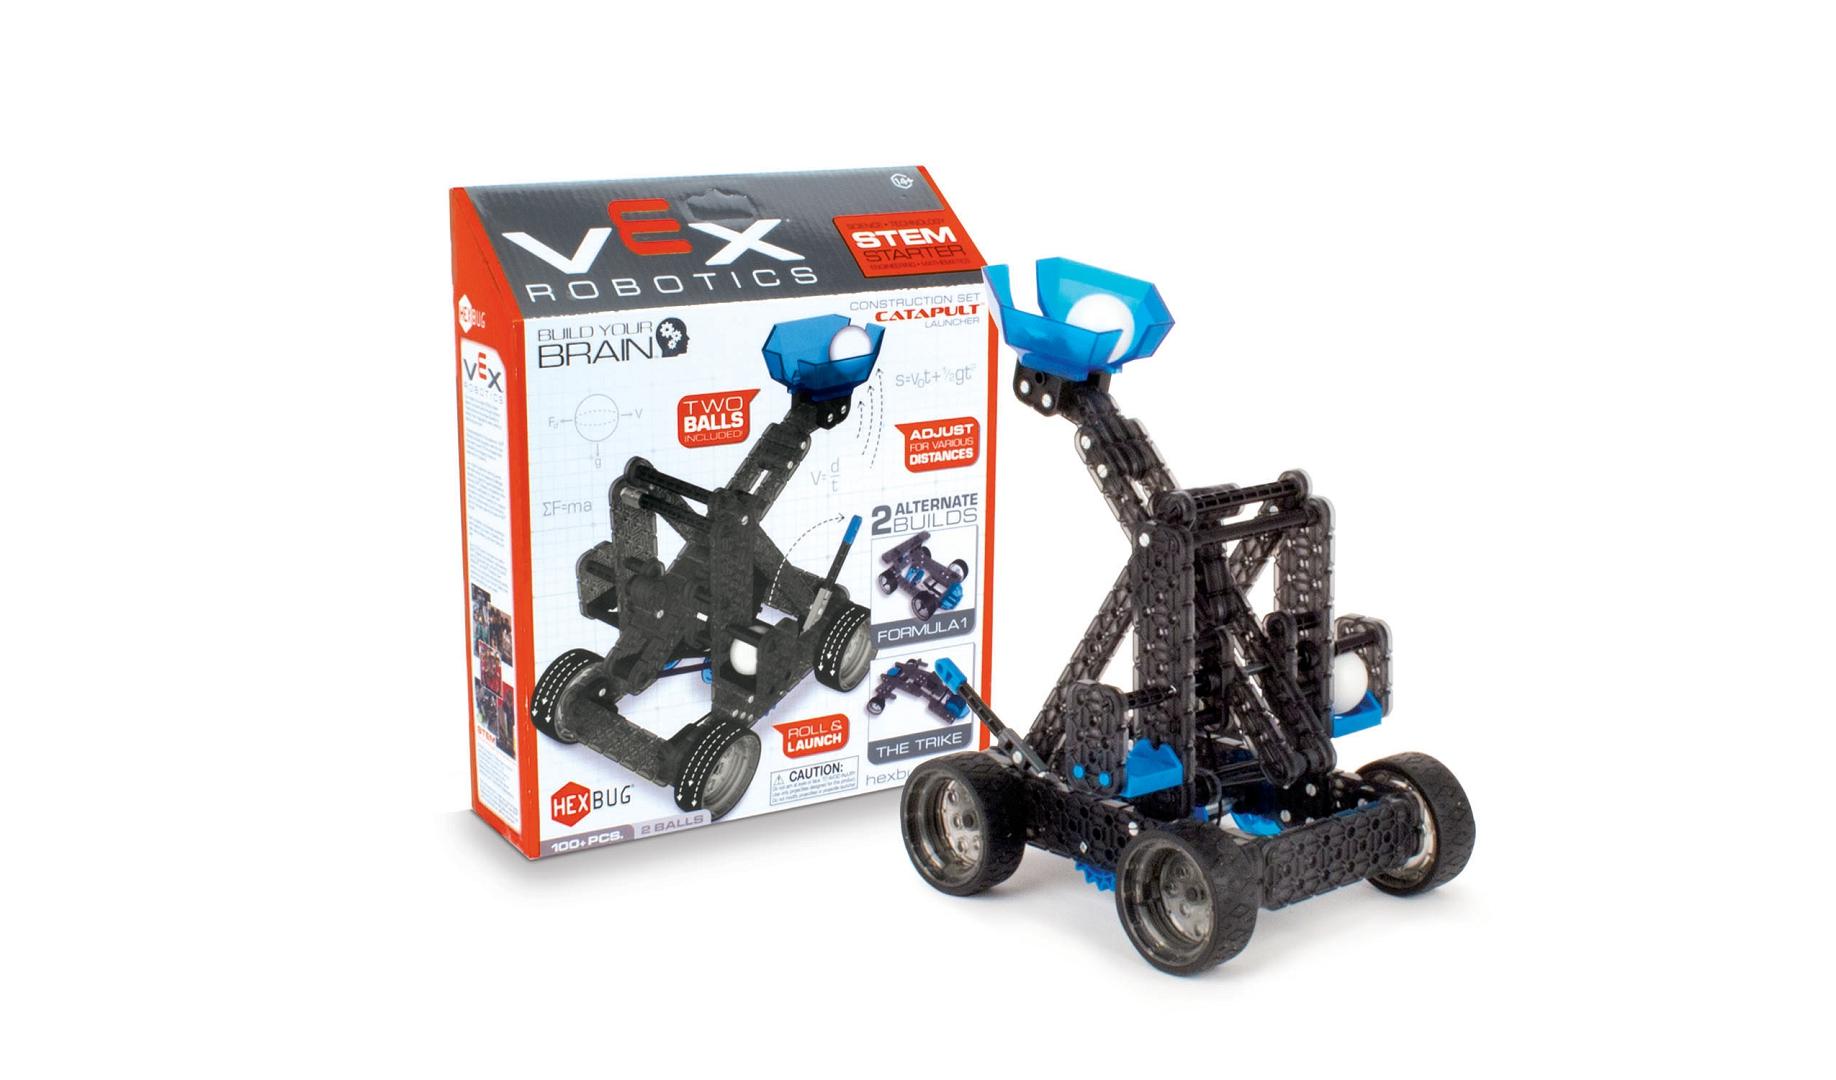 HEXBUG VEX Robotics Catapult